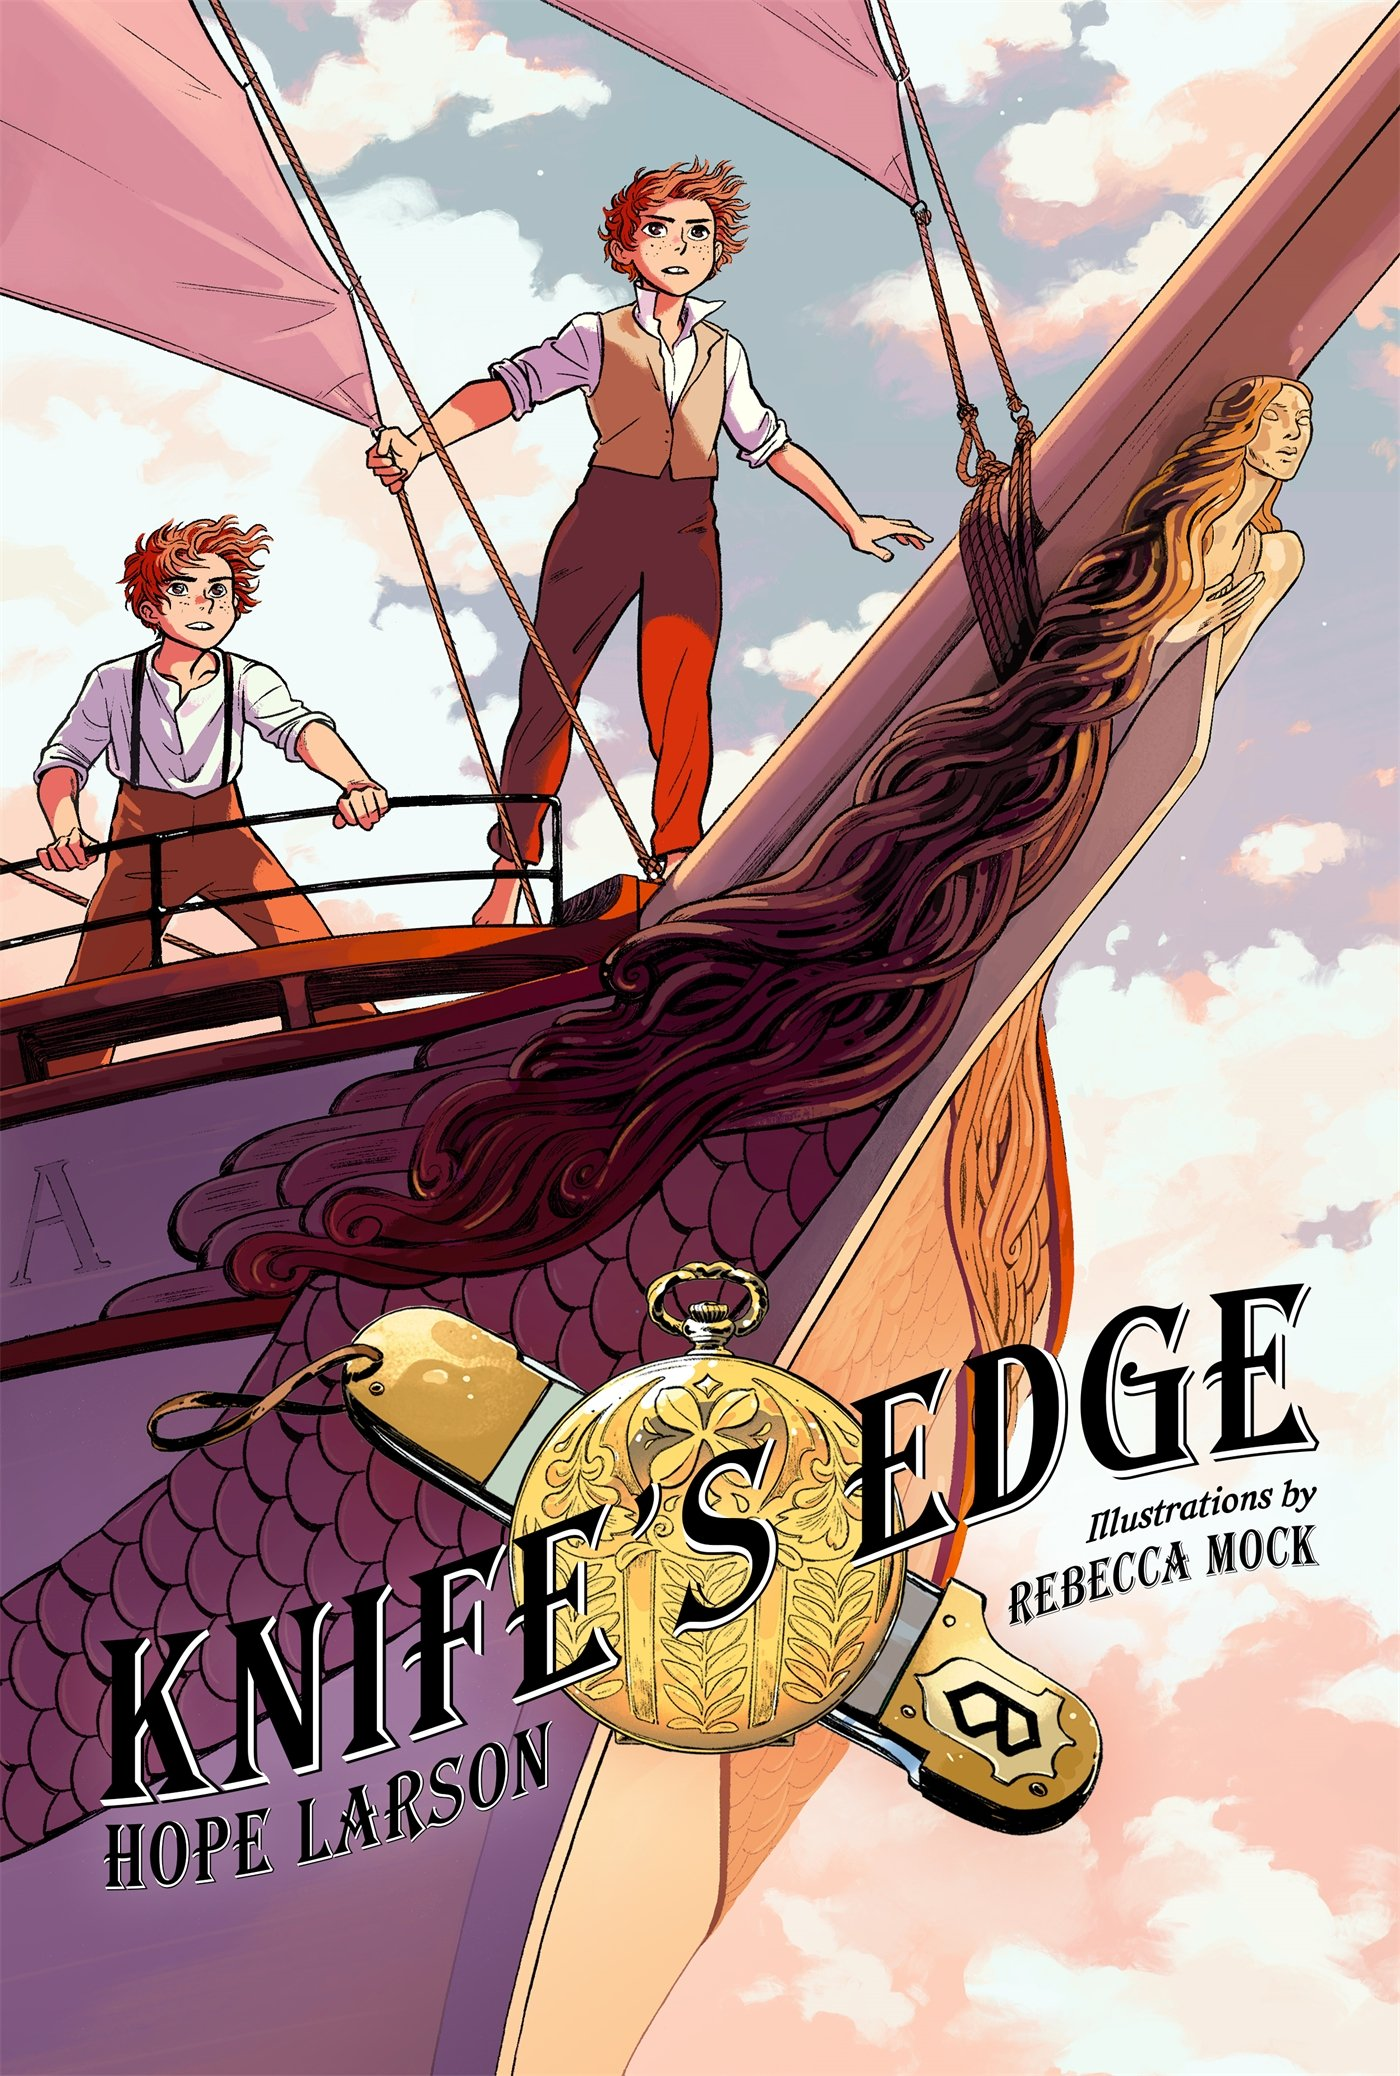 Knife's Edge: A Graphic Novel (Four Points, Book 2) (Four Points, 2): Larson,  Hope, Mock, Rebecca: 9780374300449: Amazon.com: Books